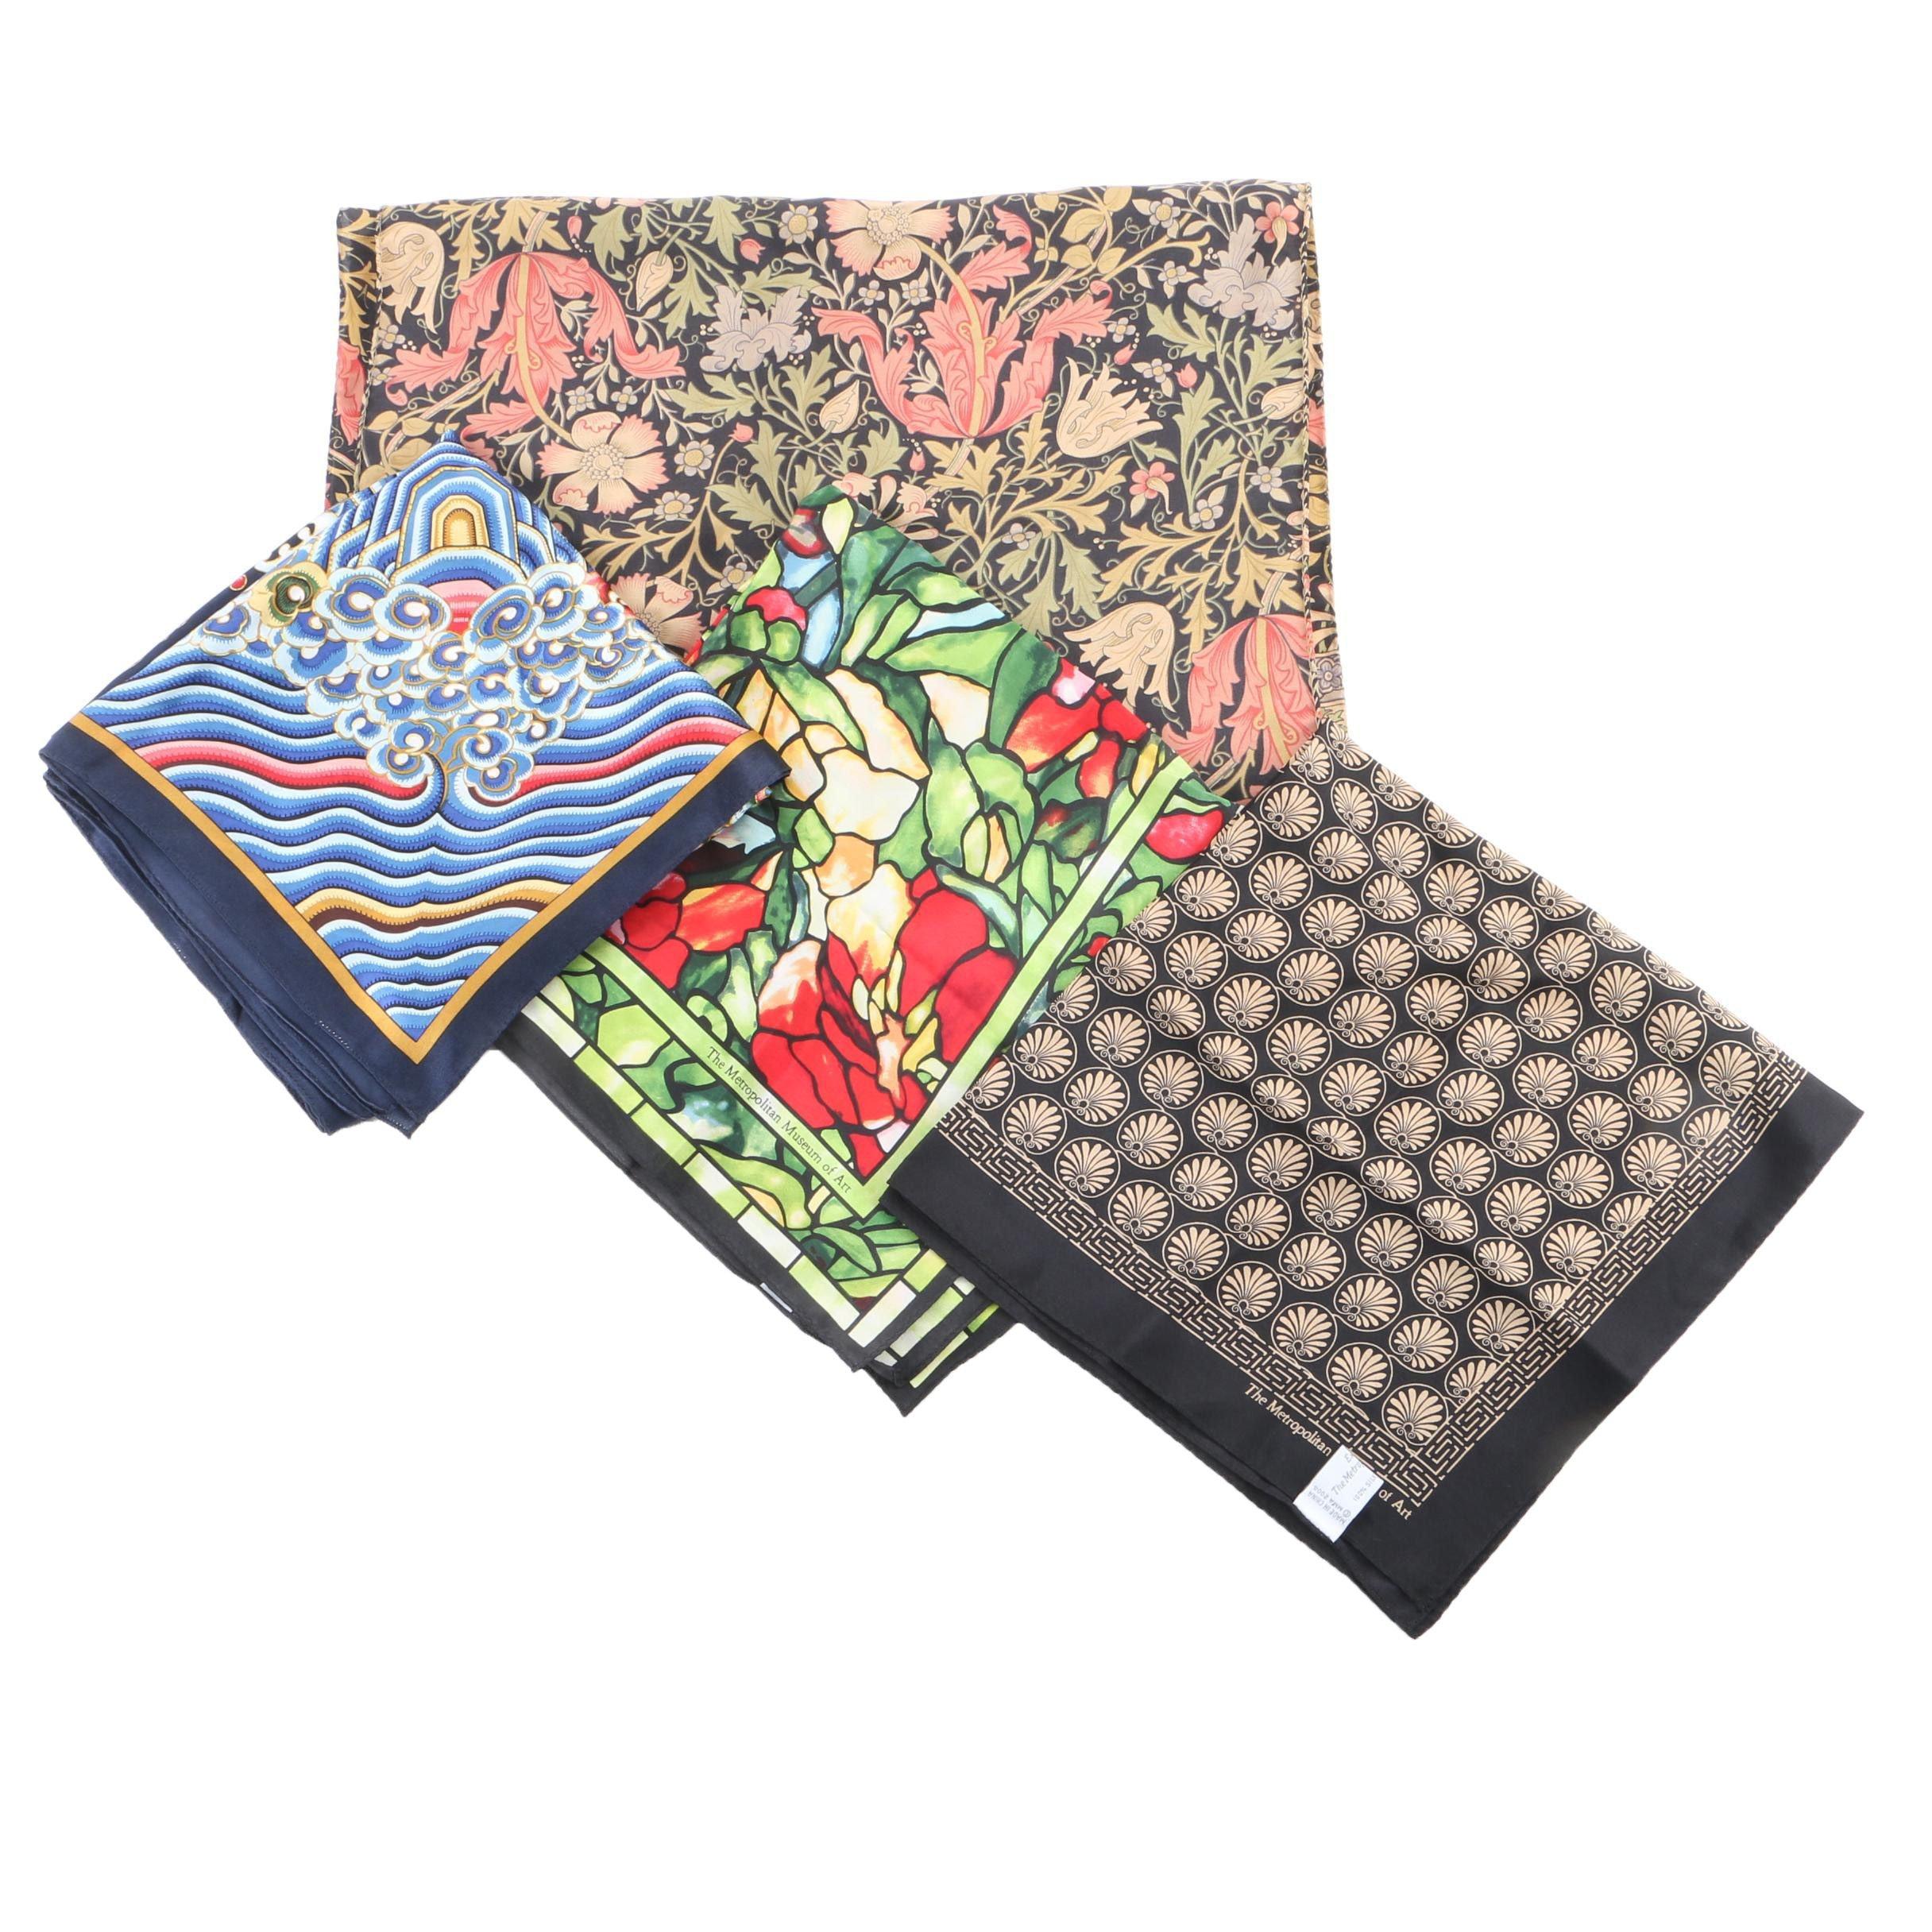 The Metropolitan Museum of Art Silk Fashion Scarves